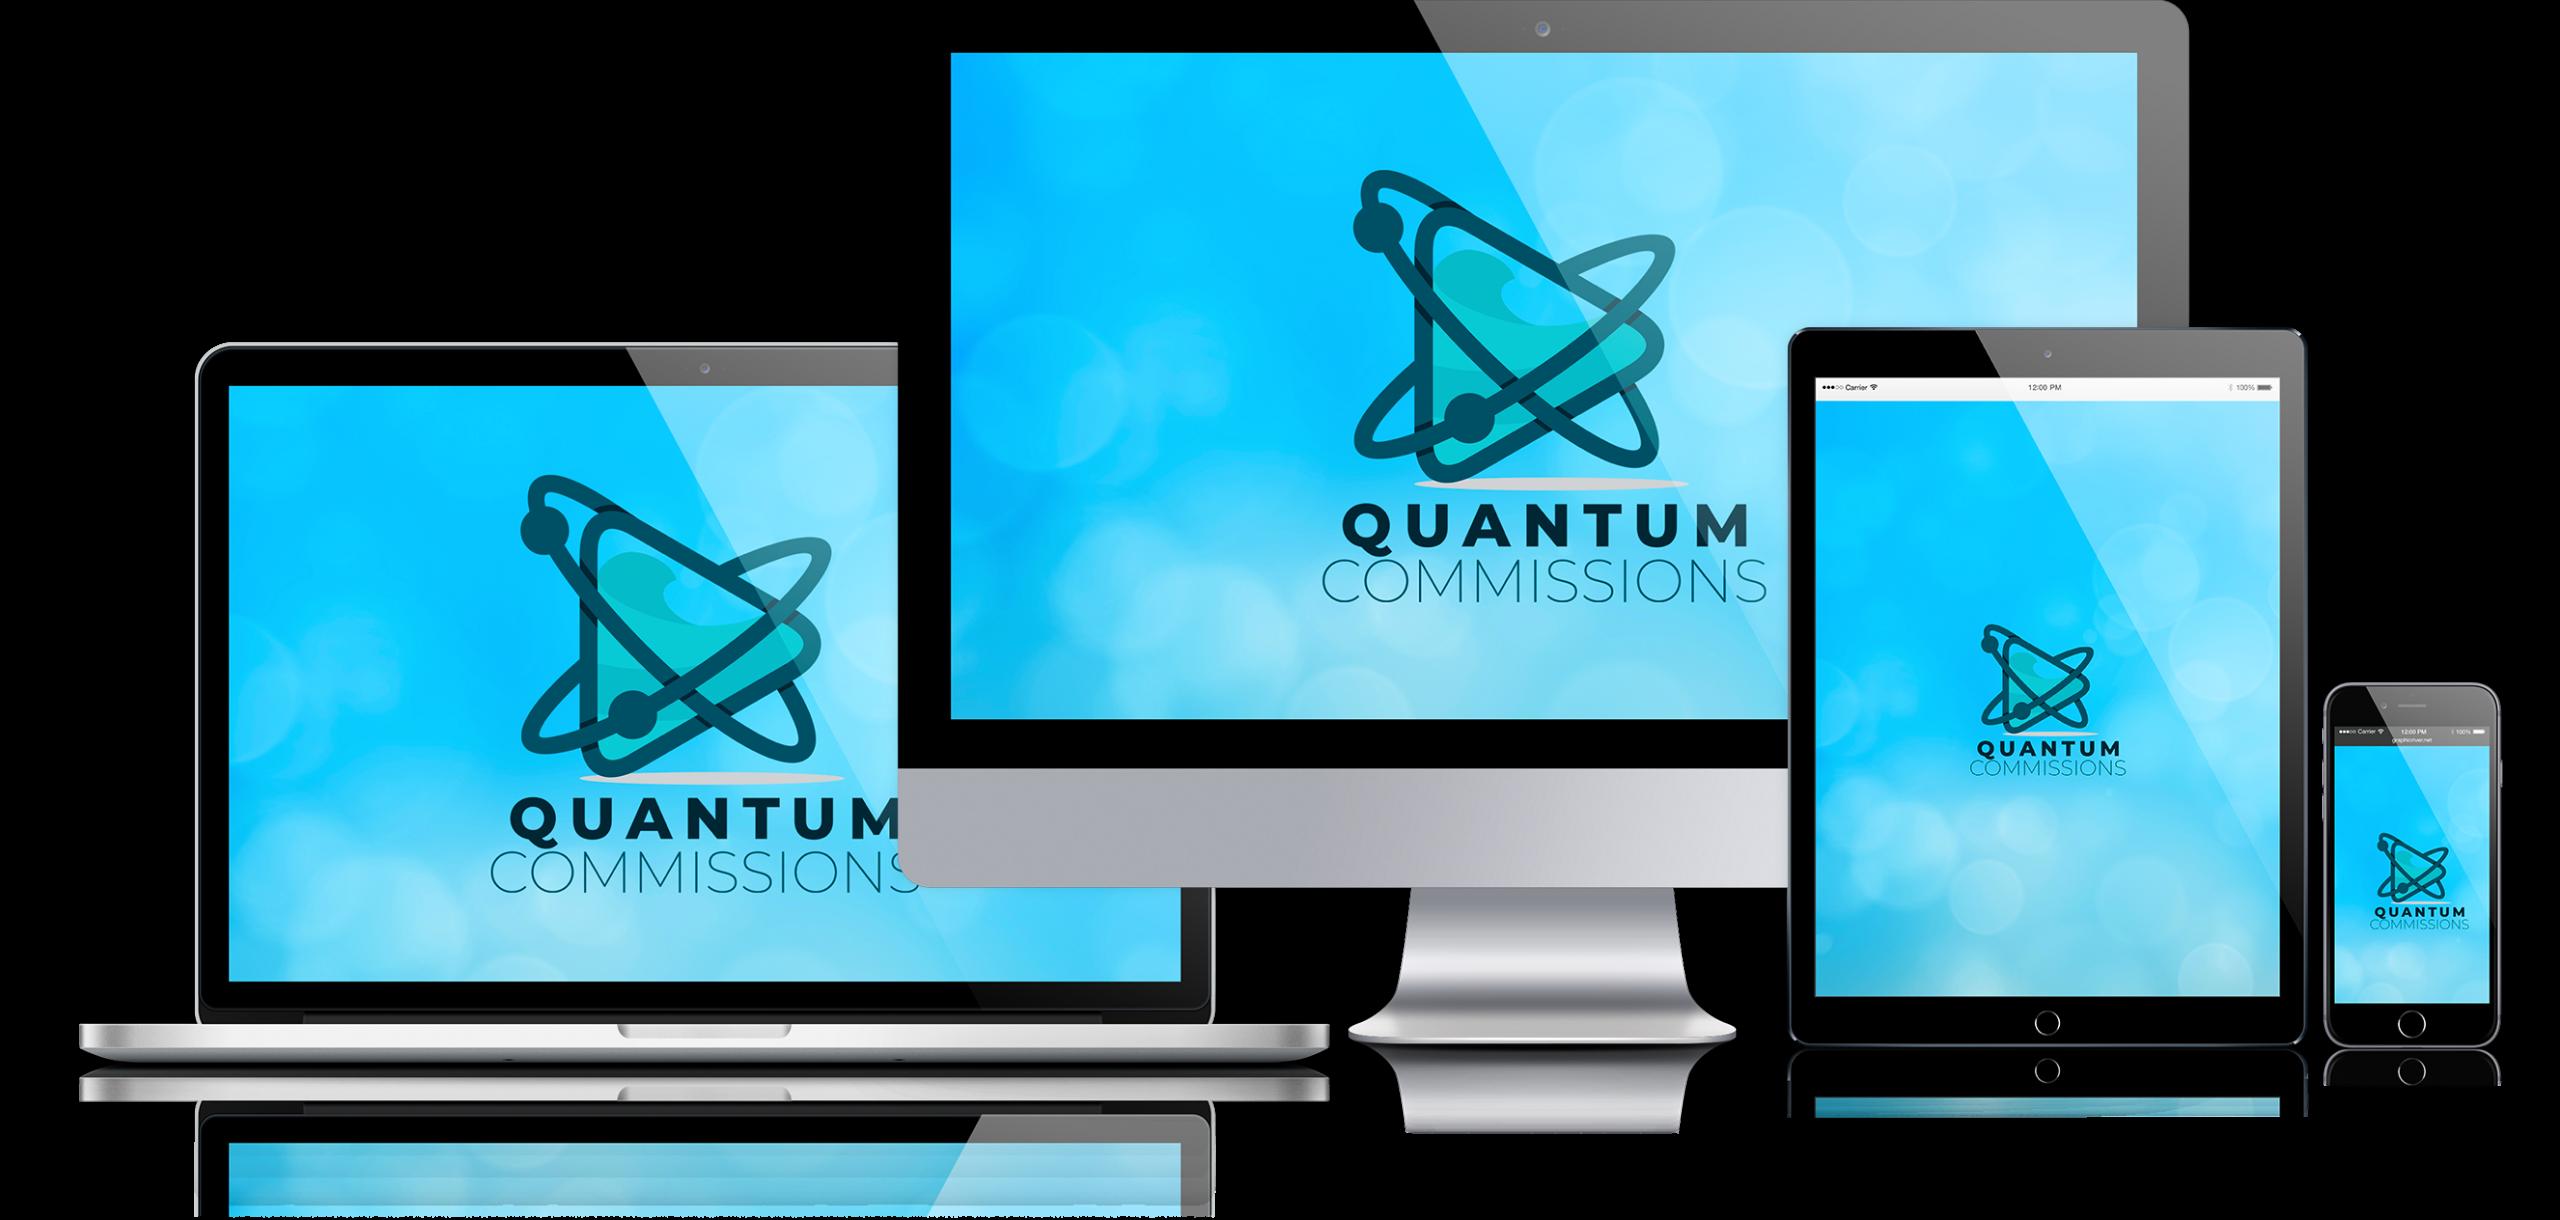 Quantum Commissions Download